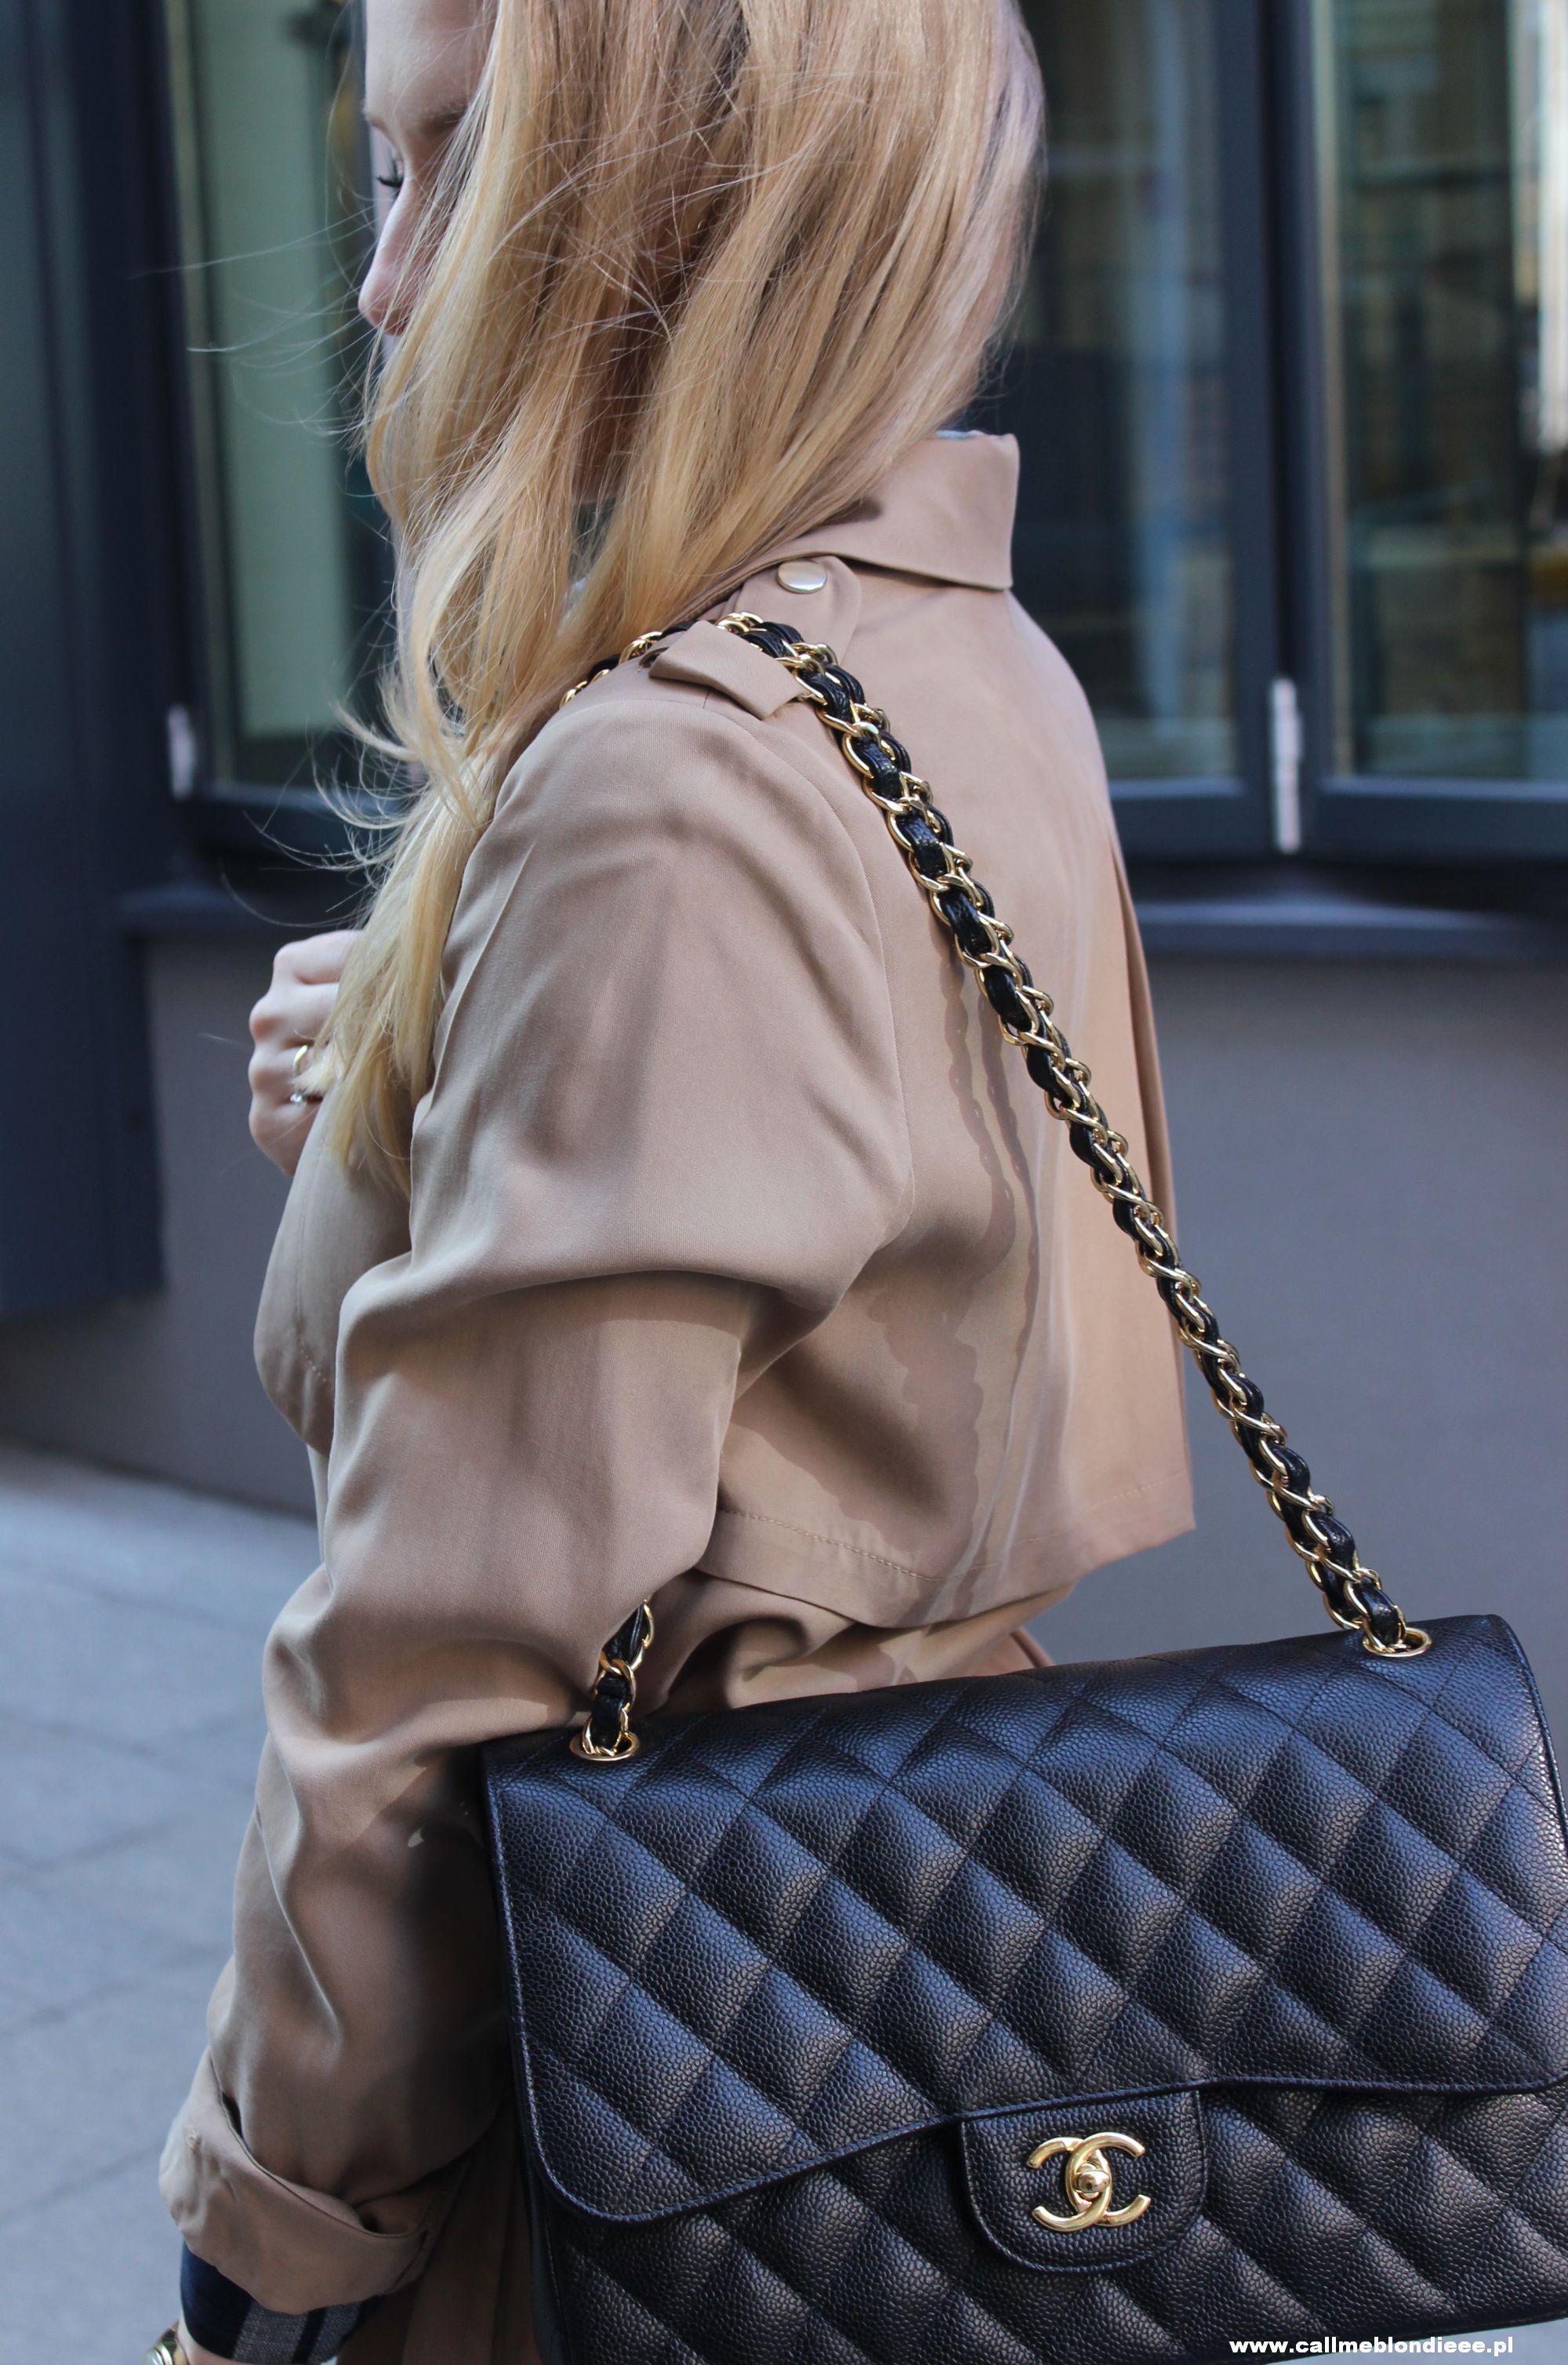 OOTD - Classic Look & Classic Bag 8